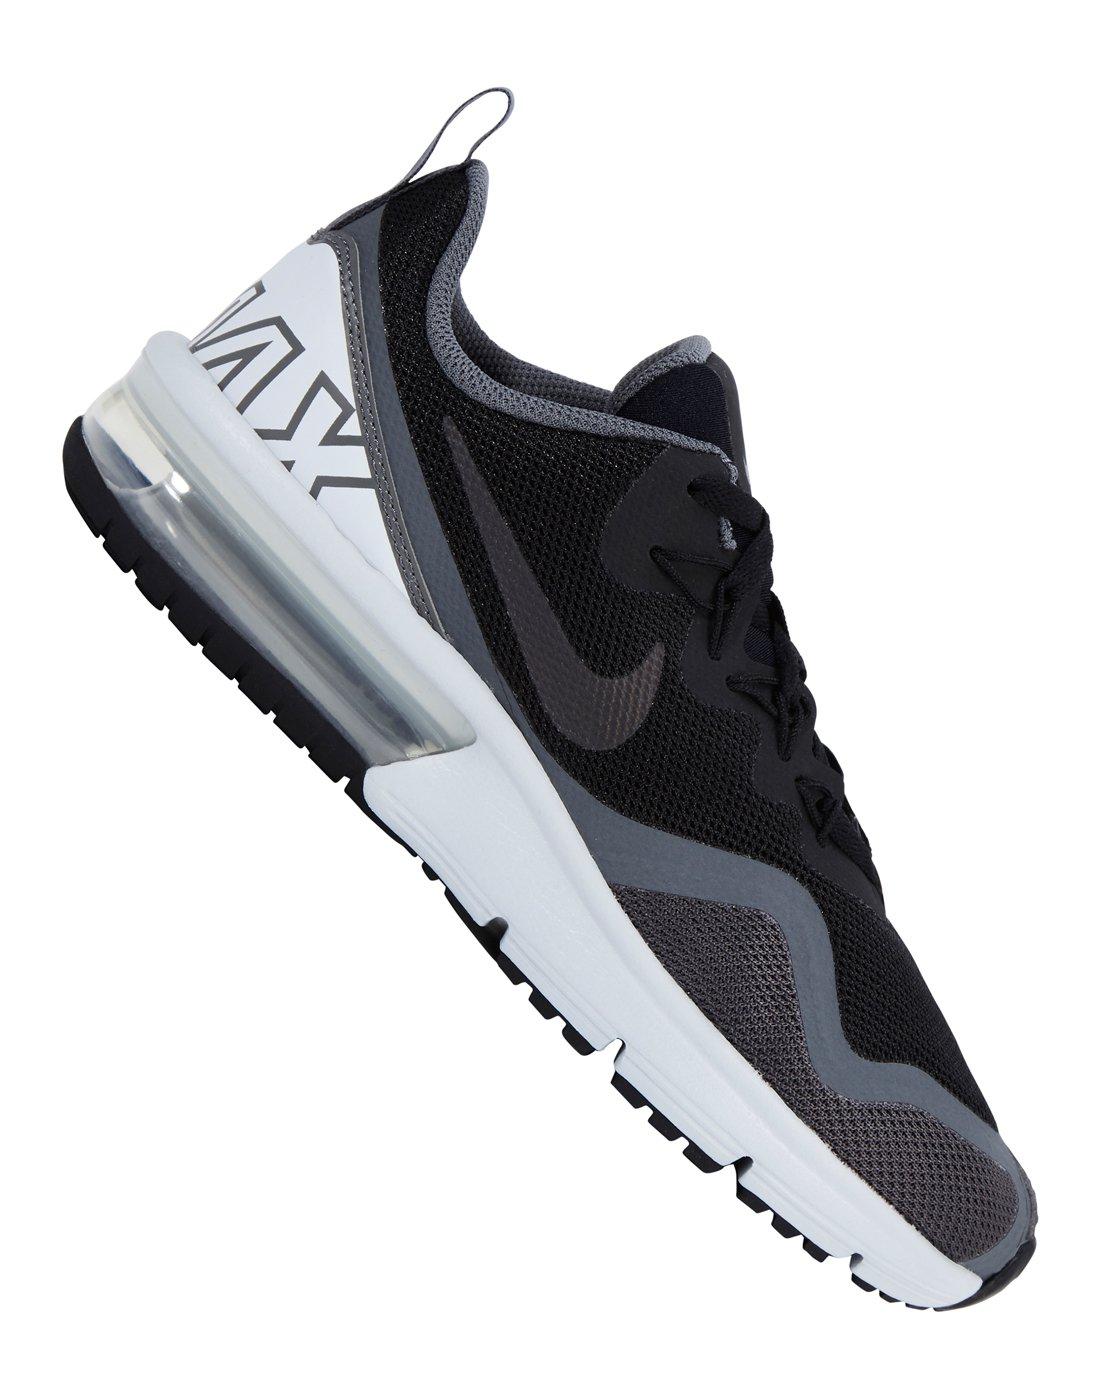 1540b2d6bcff Older Kids Nike Air Max Fury